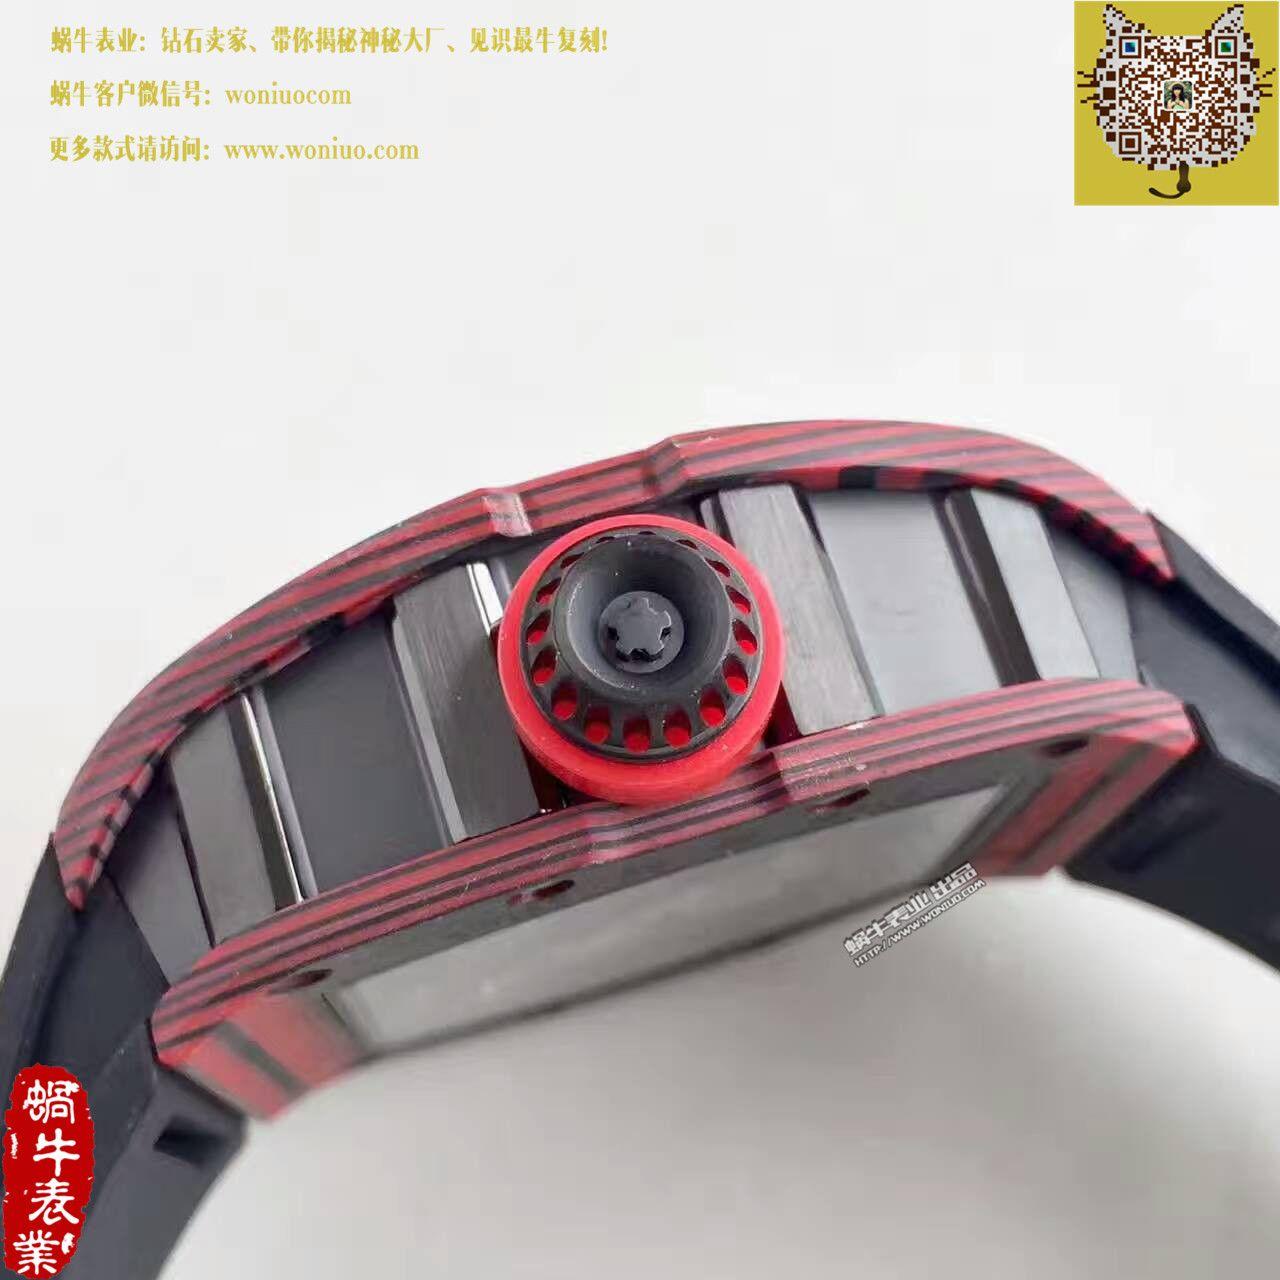 【RM厂一比一精仿手表】里查德米尔男士系列RM 50-27-01 NTPT腕表 / RM50-27-01